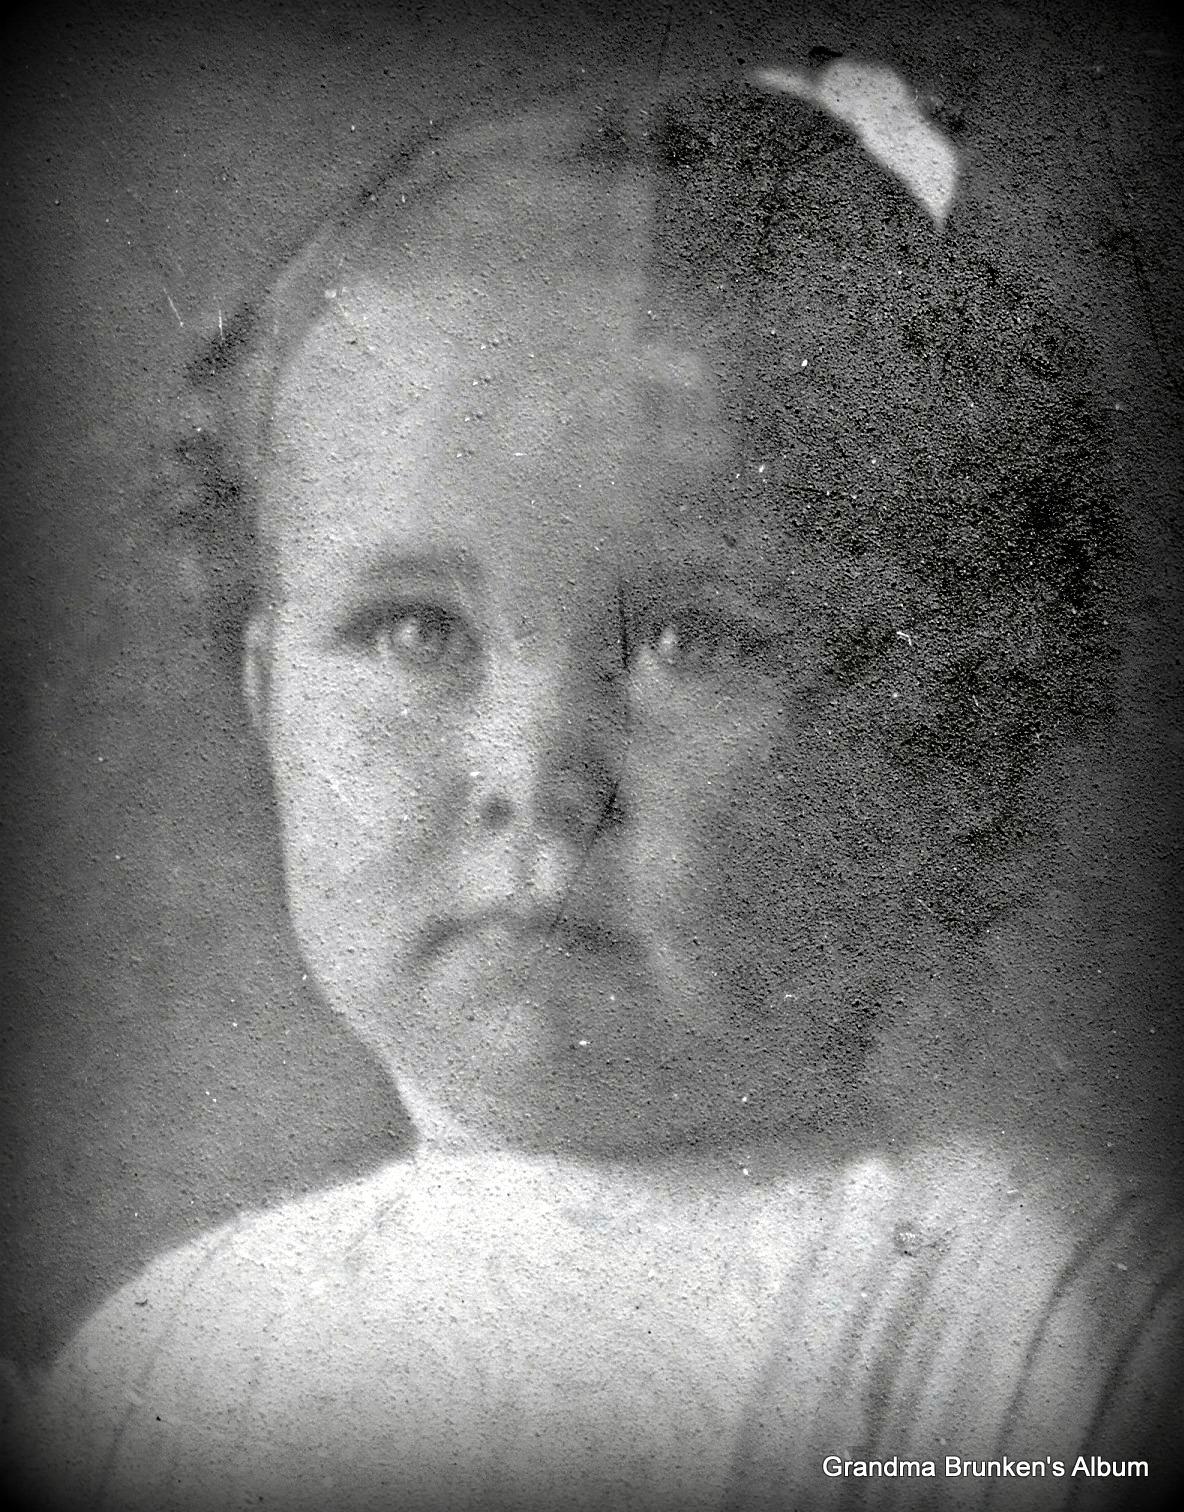 Hilda Ida Brunken - Circa 1907